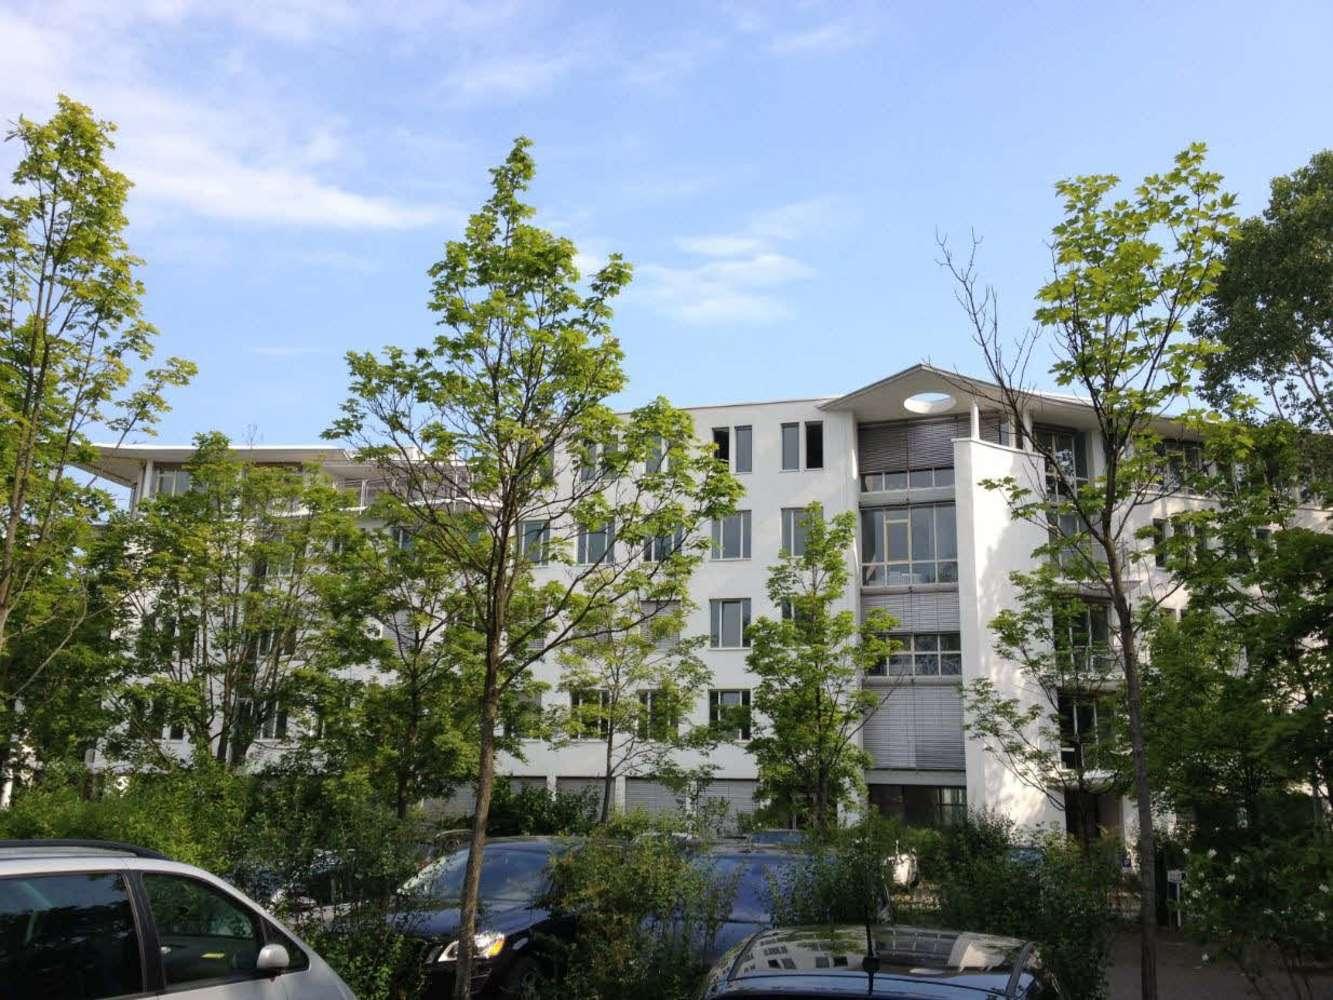 Büros Darmstadt, 64293 - Büro - Darmstadt - F1627 - 9405416